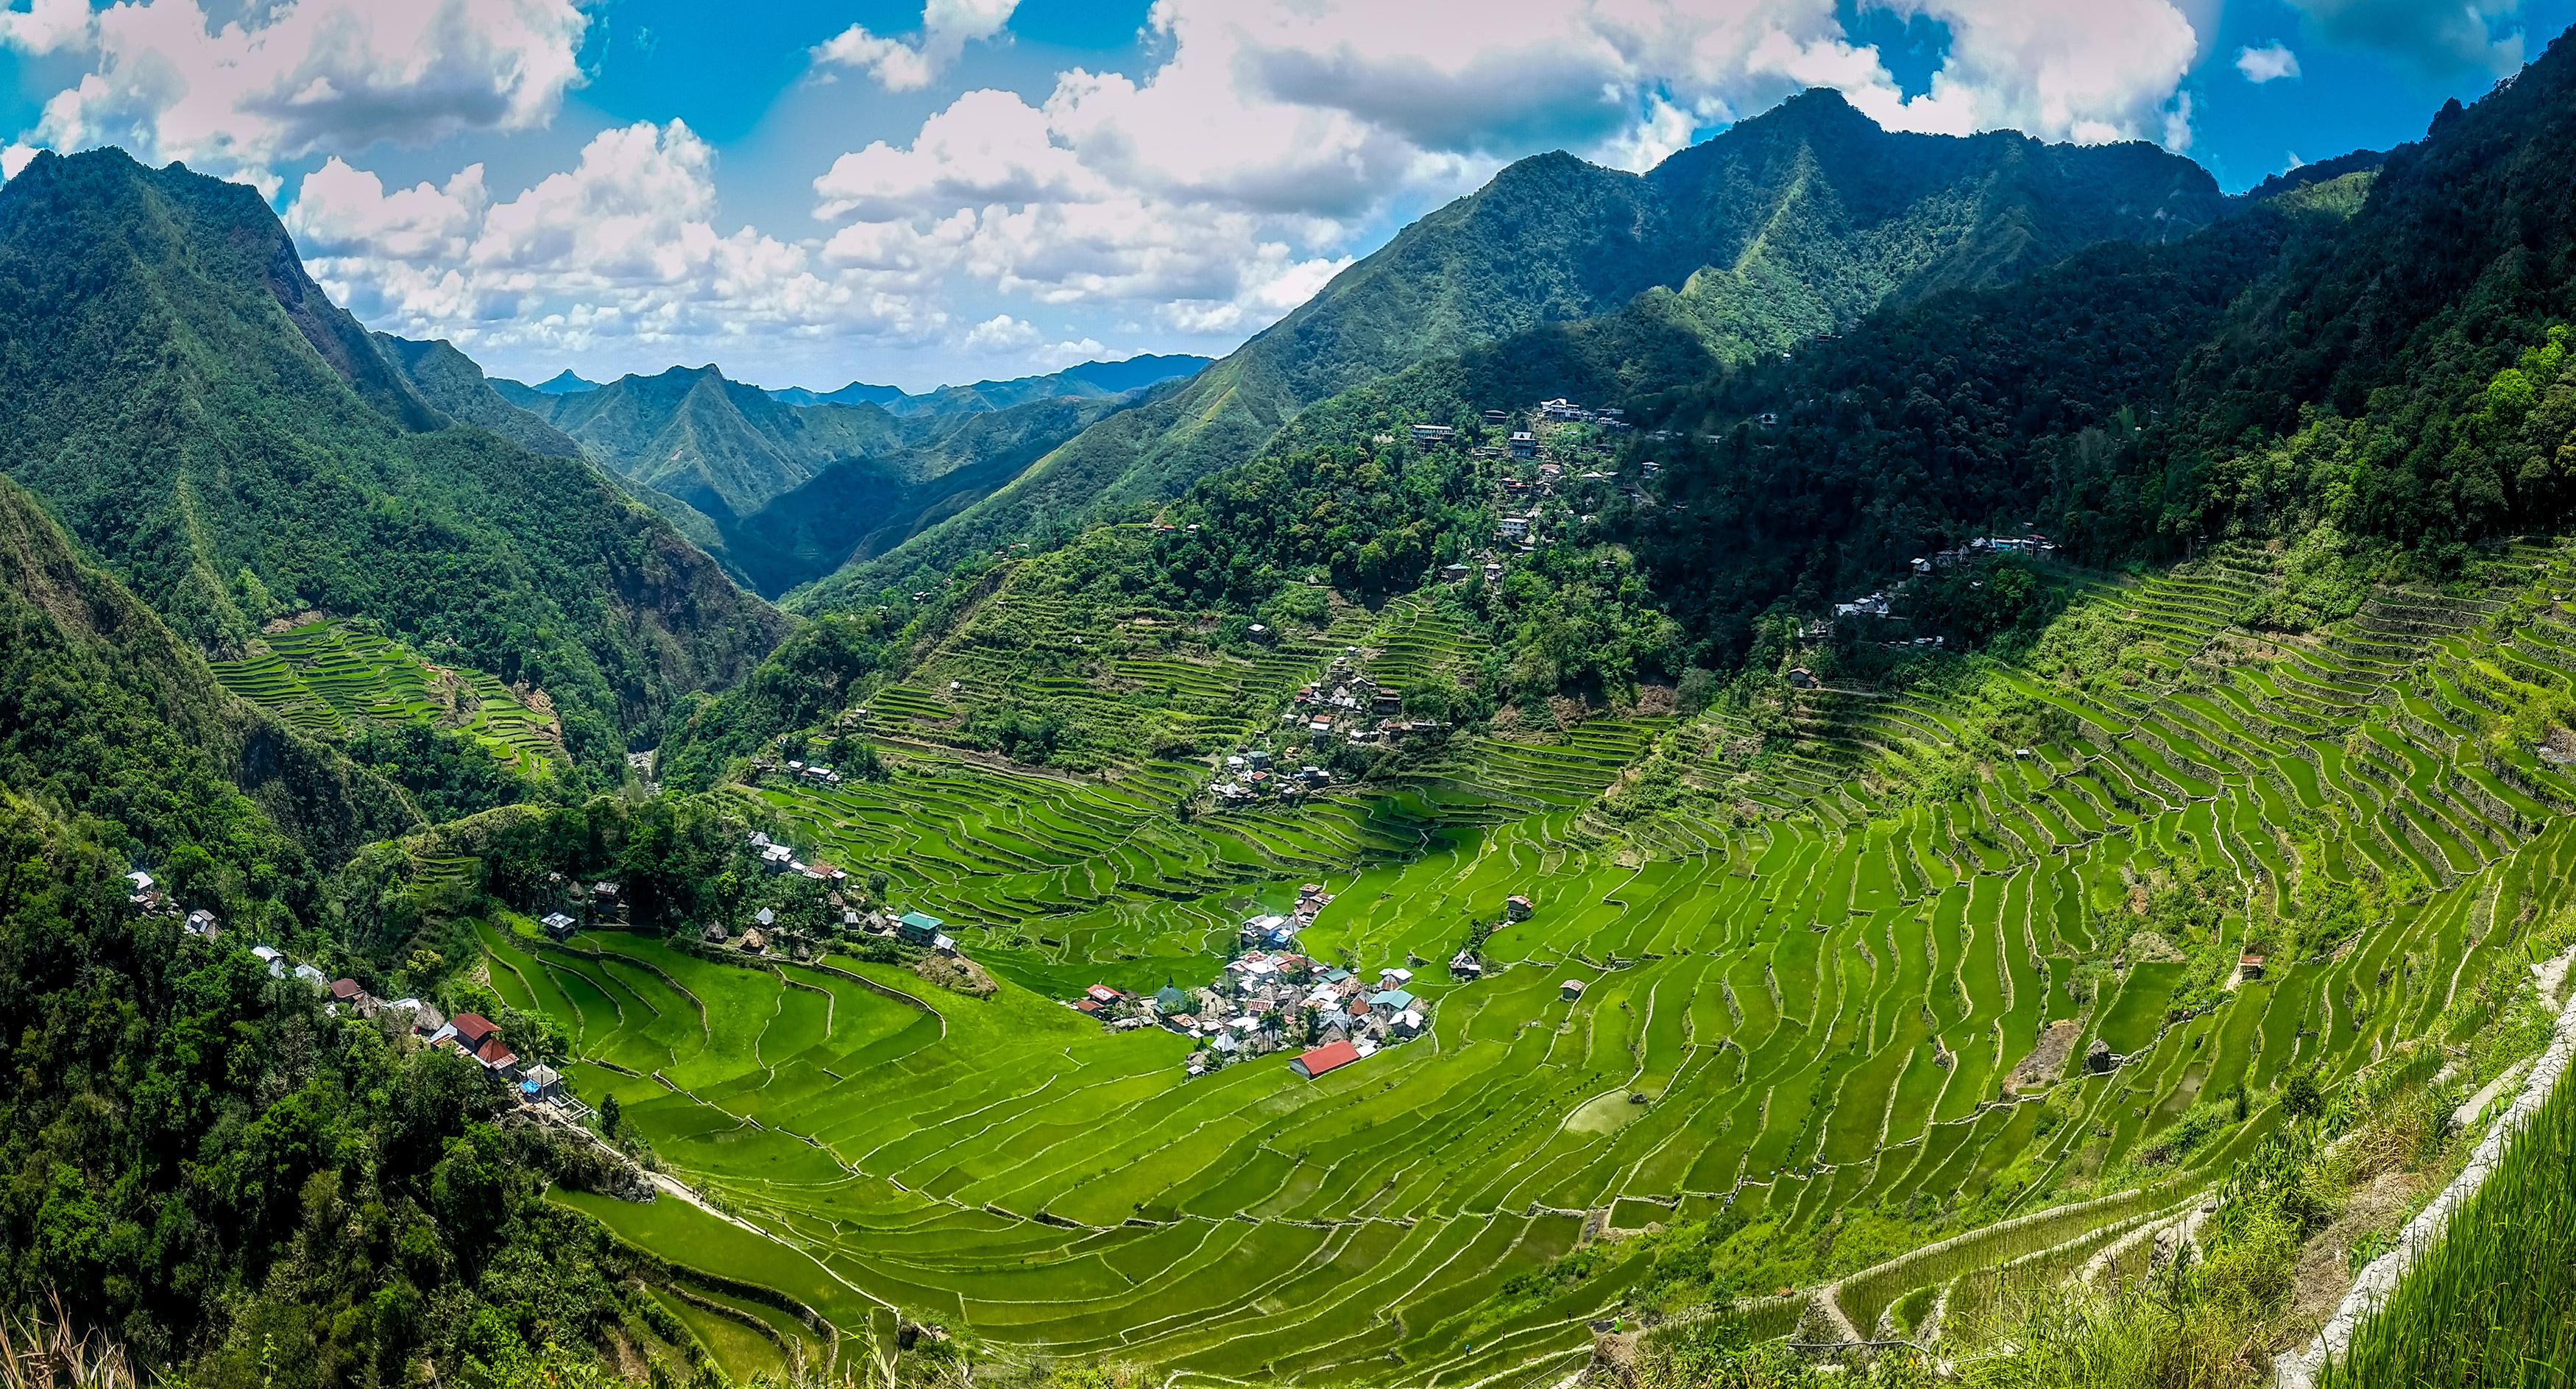 Beautiful scenery of the Batad Rice Terraces in Banaue